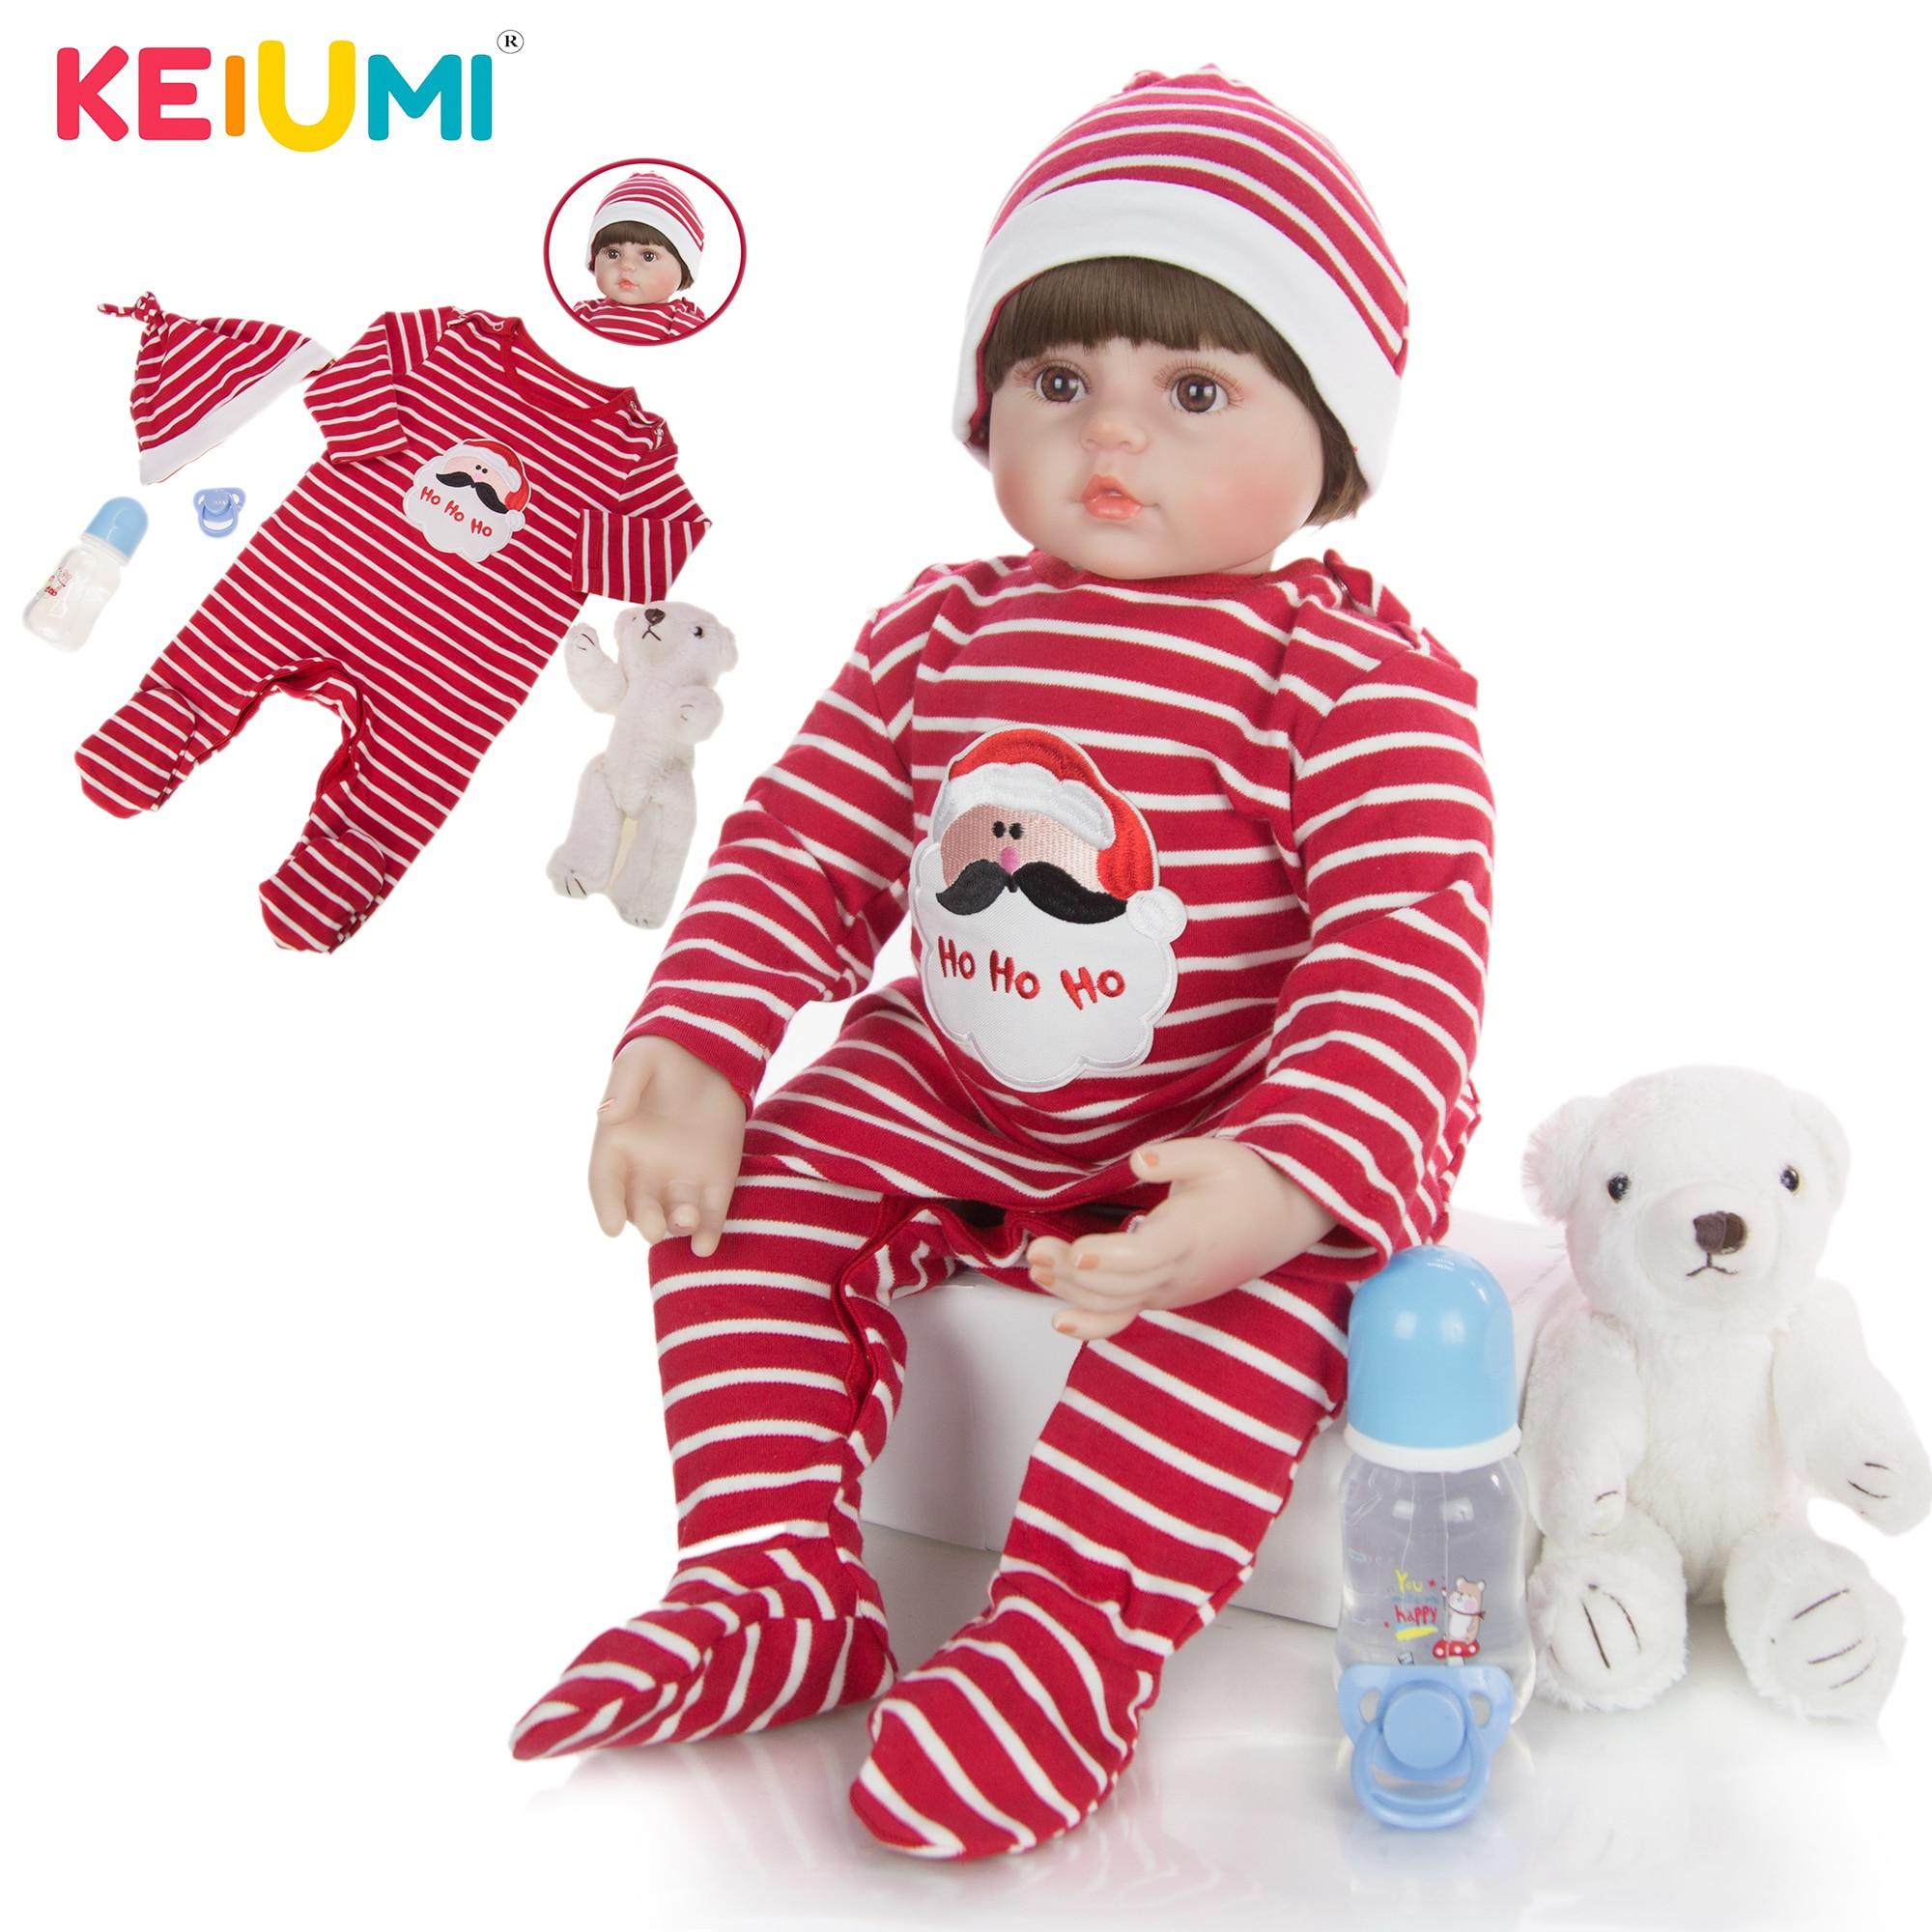 24 Inch 60 cm Realistic Reborn Baby Dolls Silicone Soft Cotton Body Fashion Boneca Reborn For Kids Christmas Gift Best Playmates